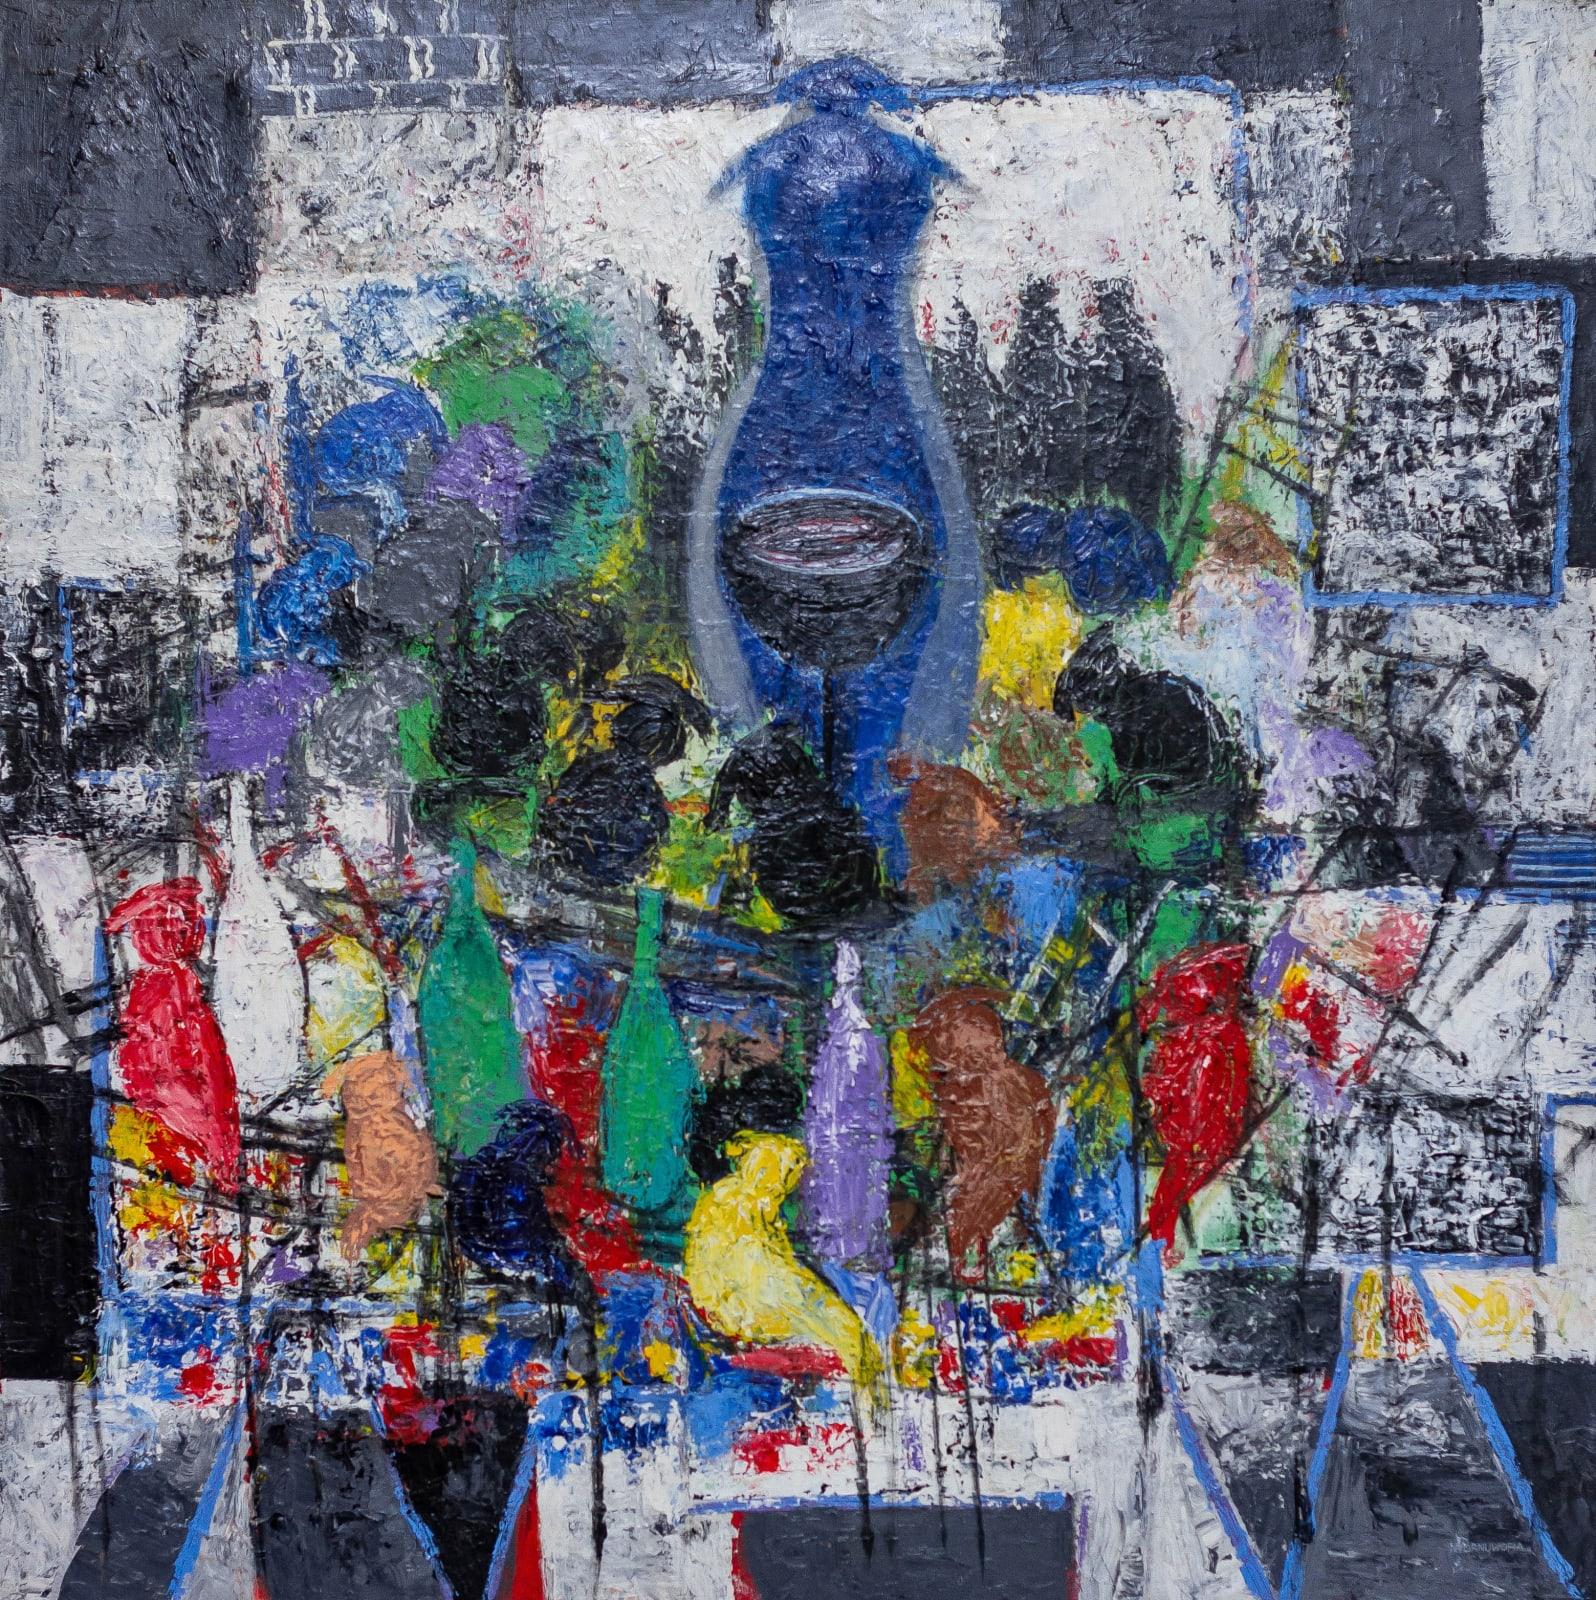 Nyornuwofia Agorsor In her presence (2015) 100 x 100 cm Acrylic on canvas